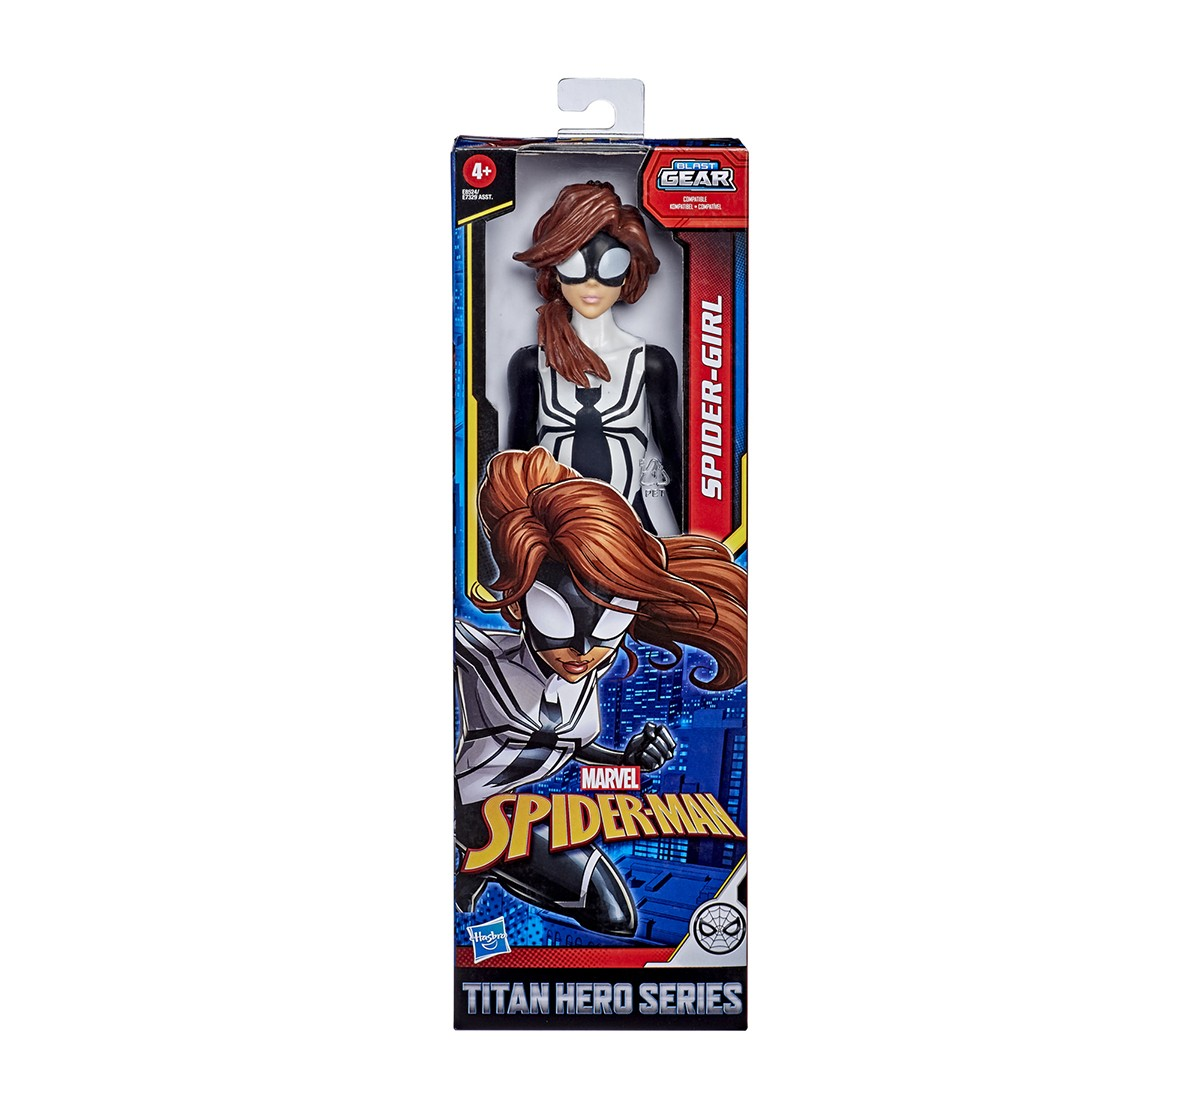 Marvel Spider-Man Titan Hero Series Blast Gear Web Warriors Spider-Girl Action Figures for Kids age 4Y+